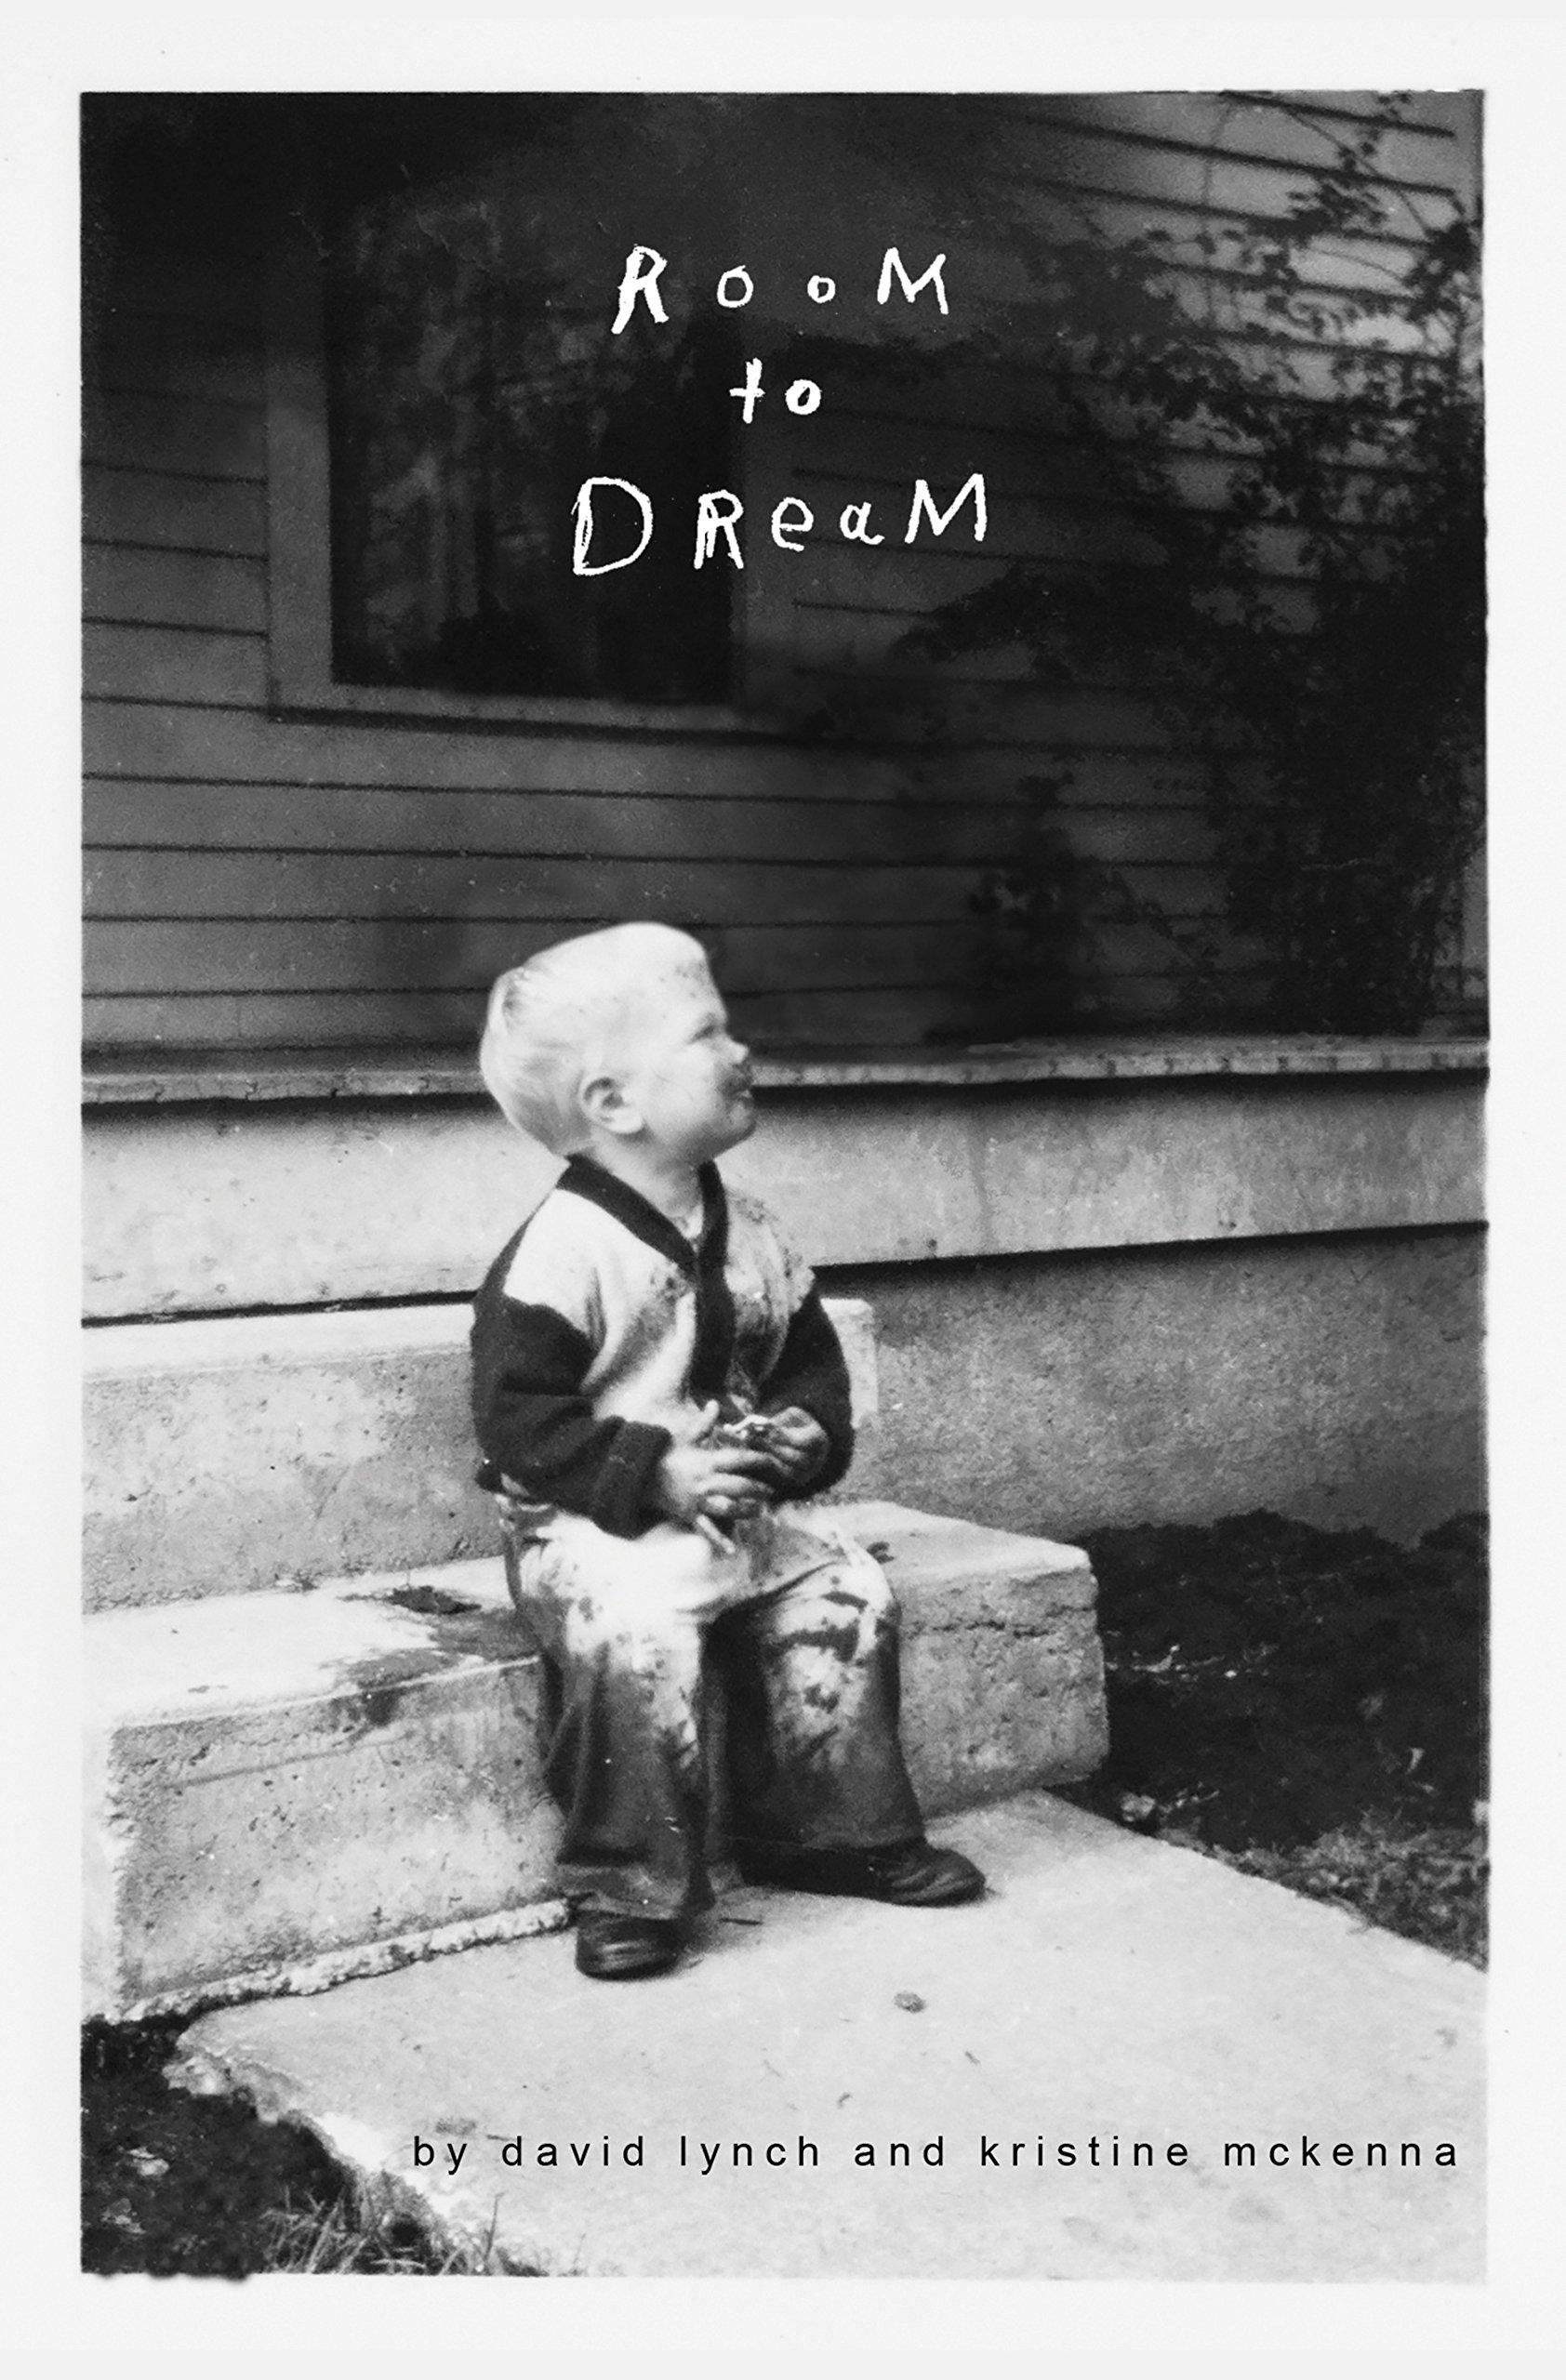 david lynch room to dream book cover David Lynch details hybrid biography/memoir, Room to Dream, arriving next week